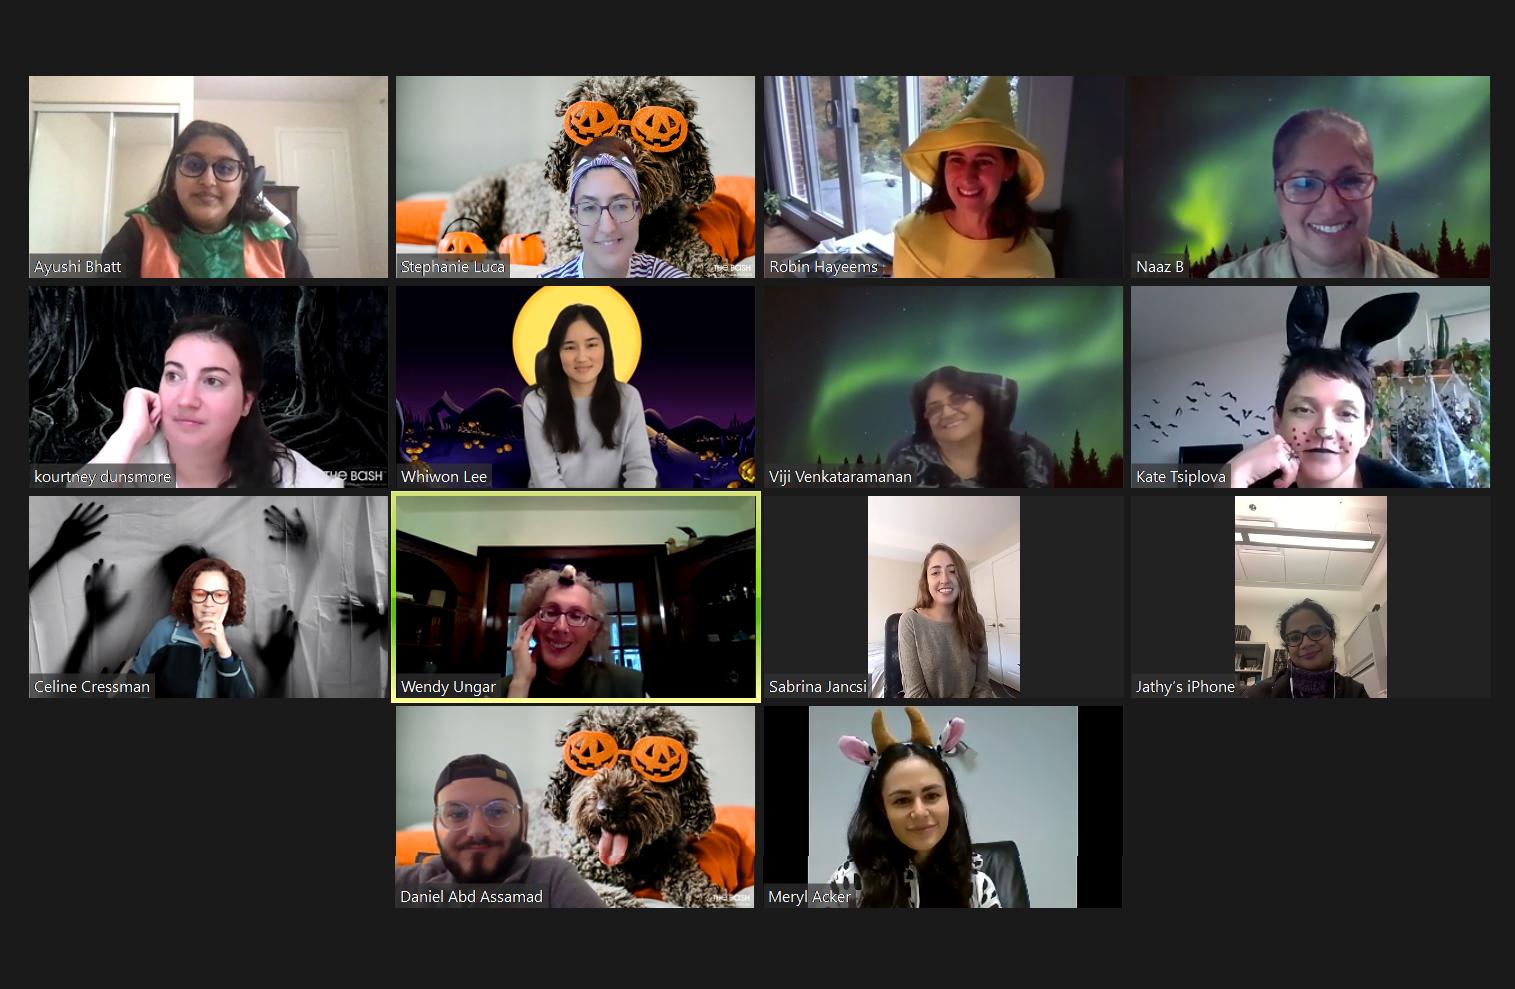 The lab celebrating Halloween 2020 via Zoom